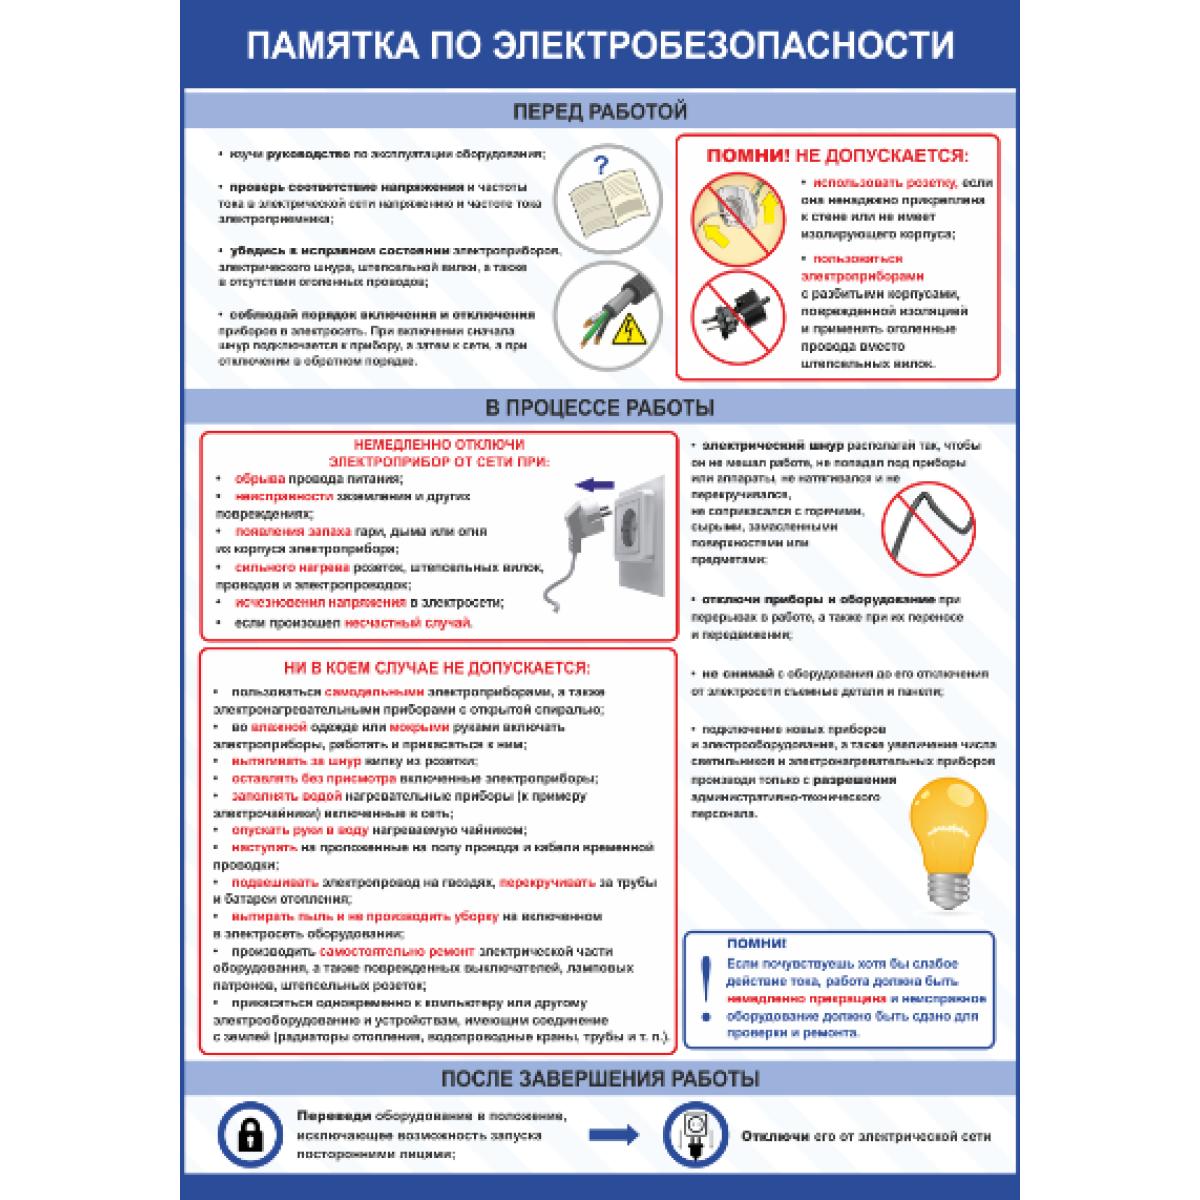 Плакат по охране труда  Памятка по электробезопасности